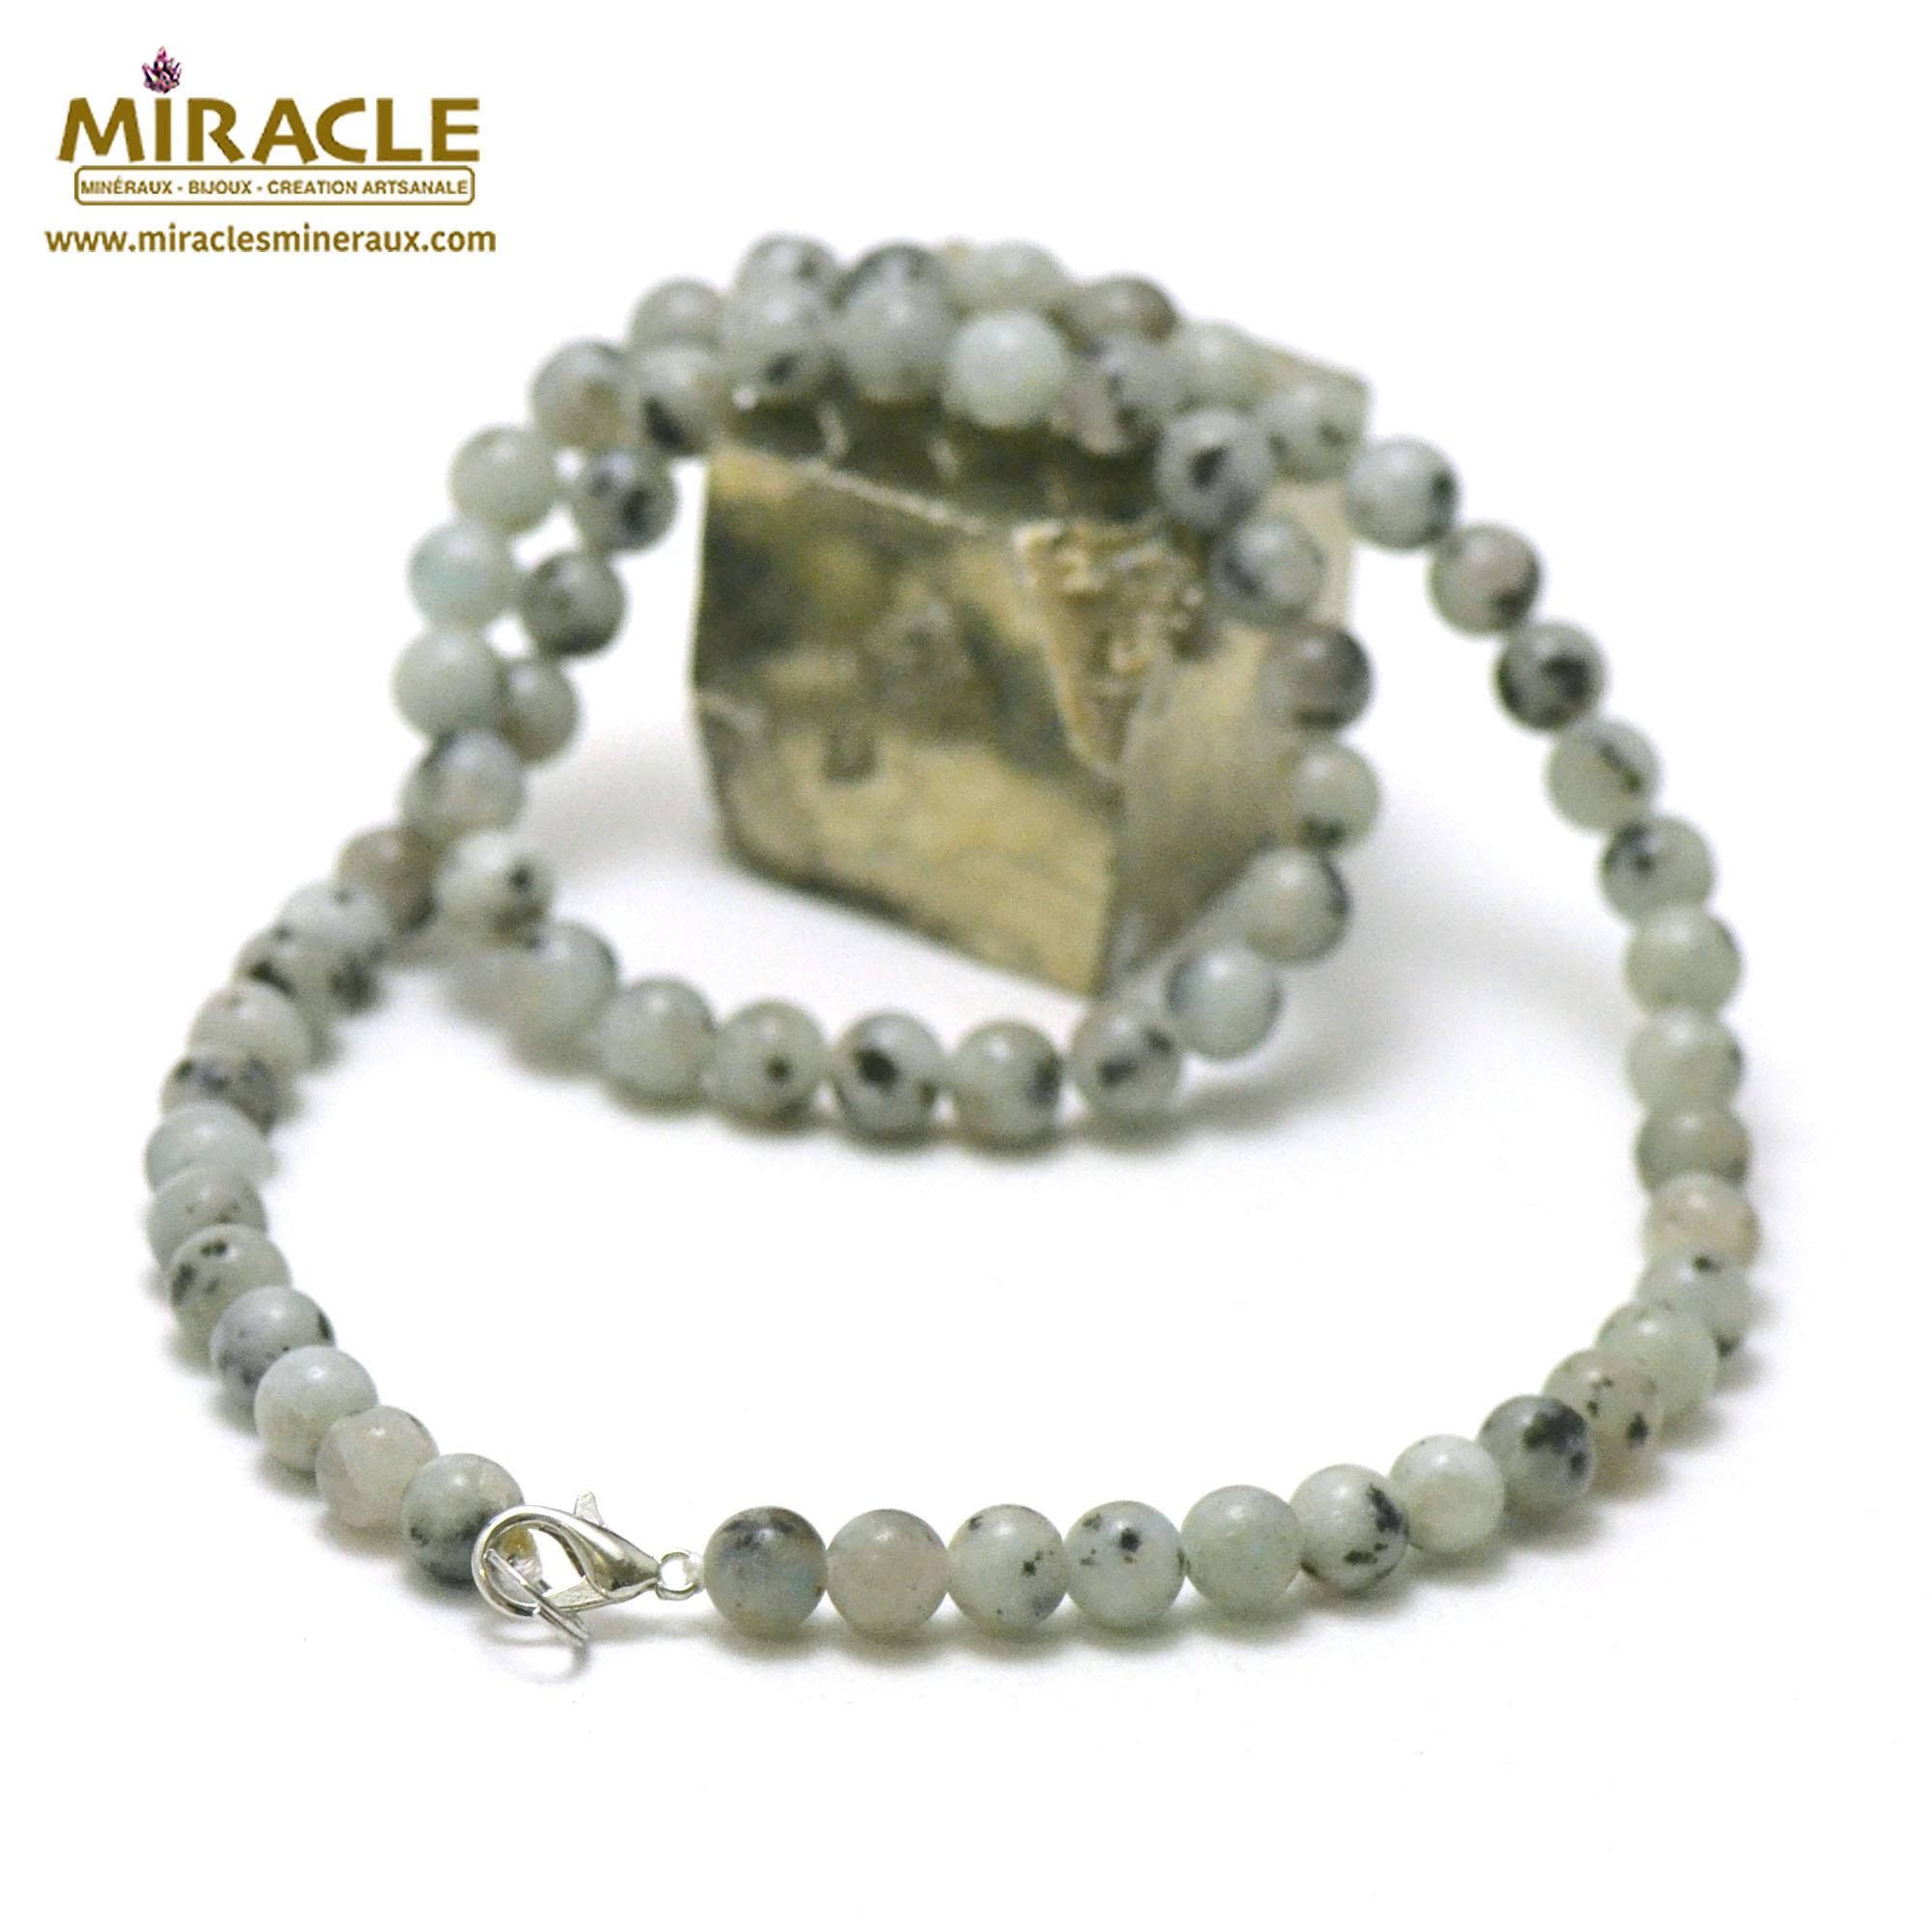 collier Jade néphrite des Andes perle ronde 6 mm